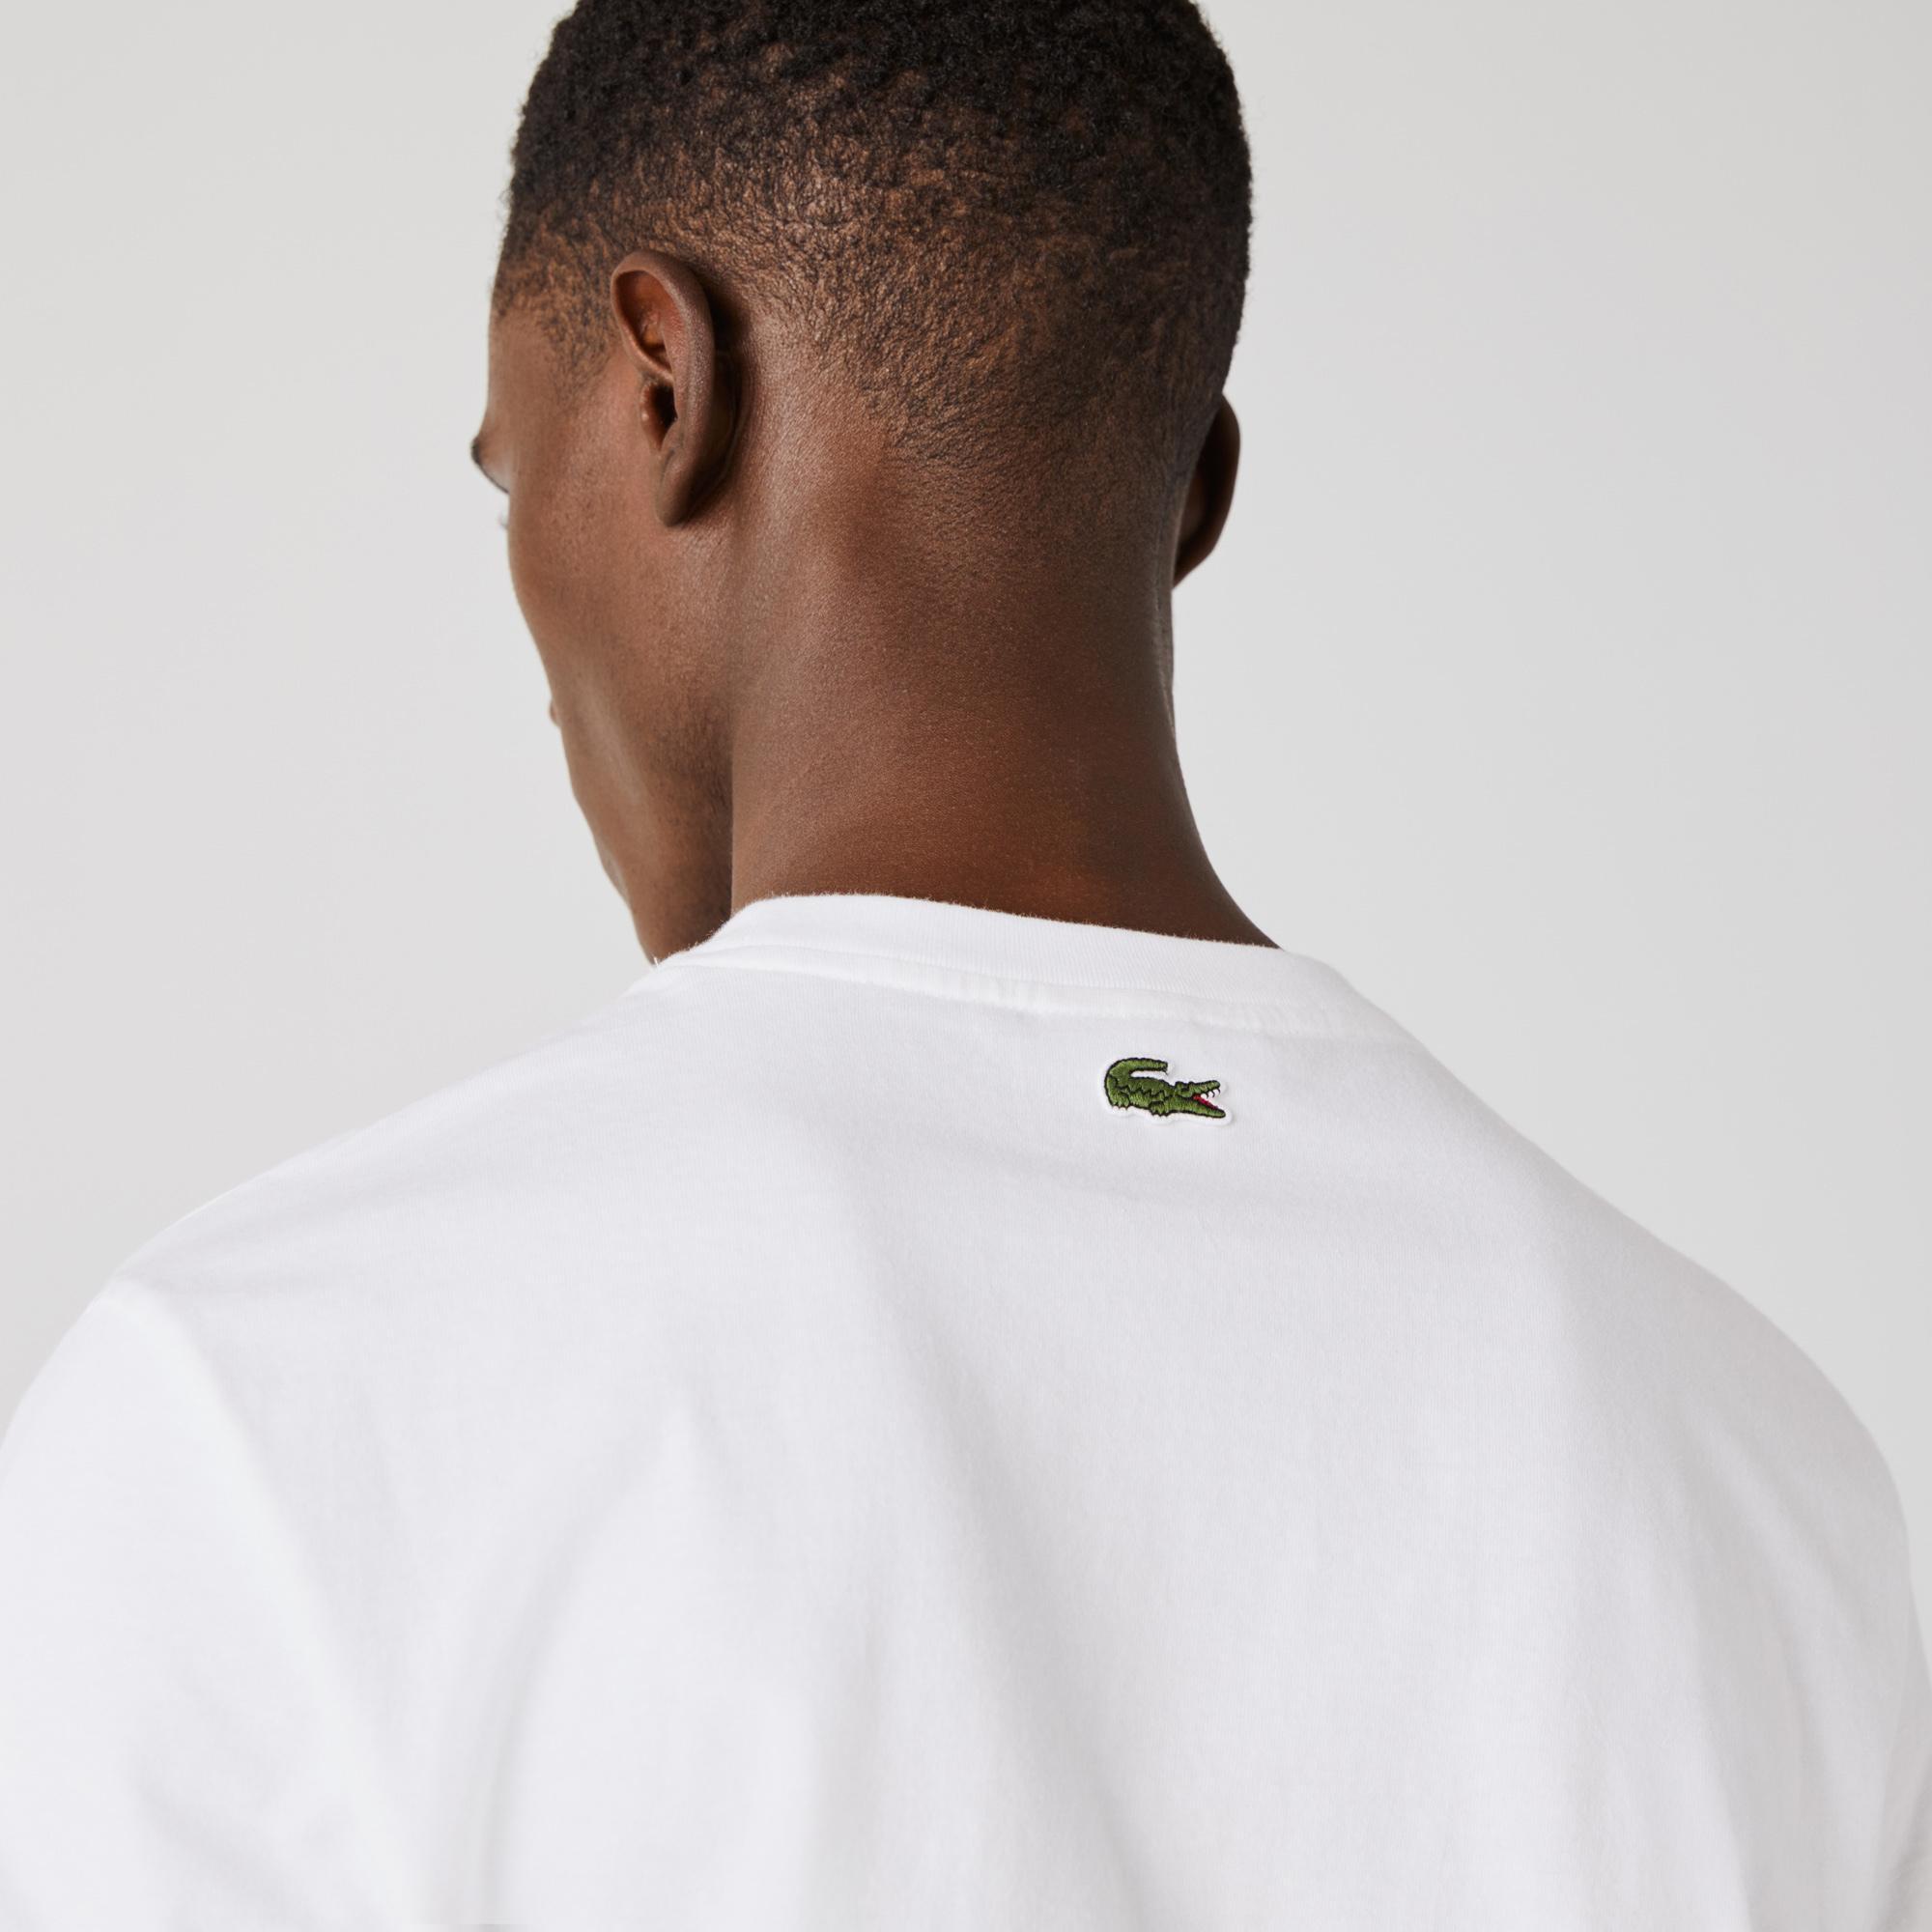 Lacoste Erkek Regular Fit Bisiklet Yaka Baskılı Beyaz T-Shirt